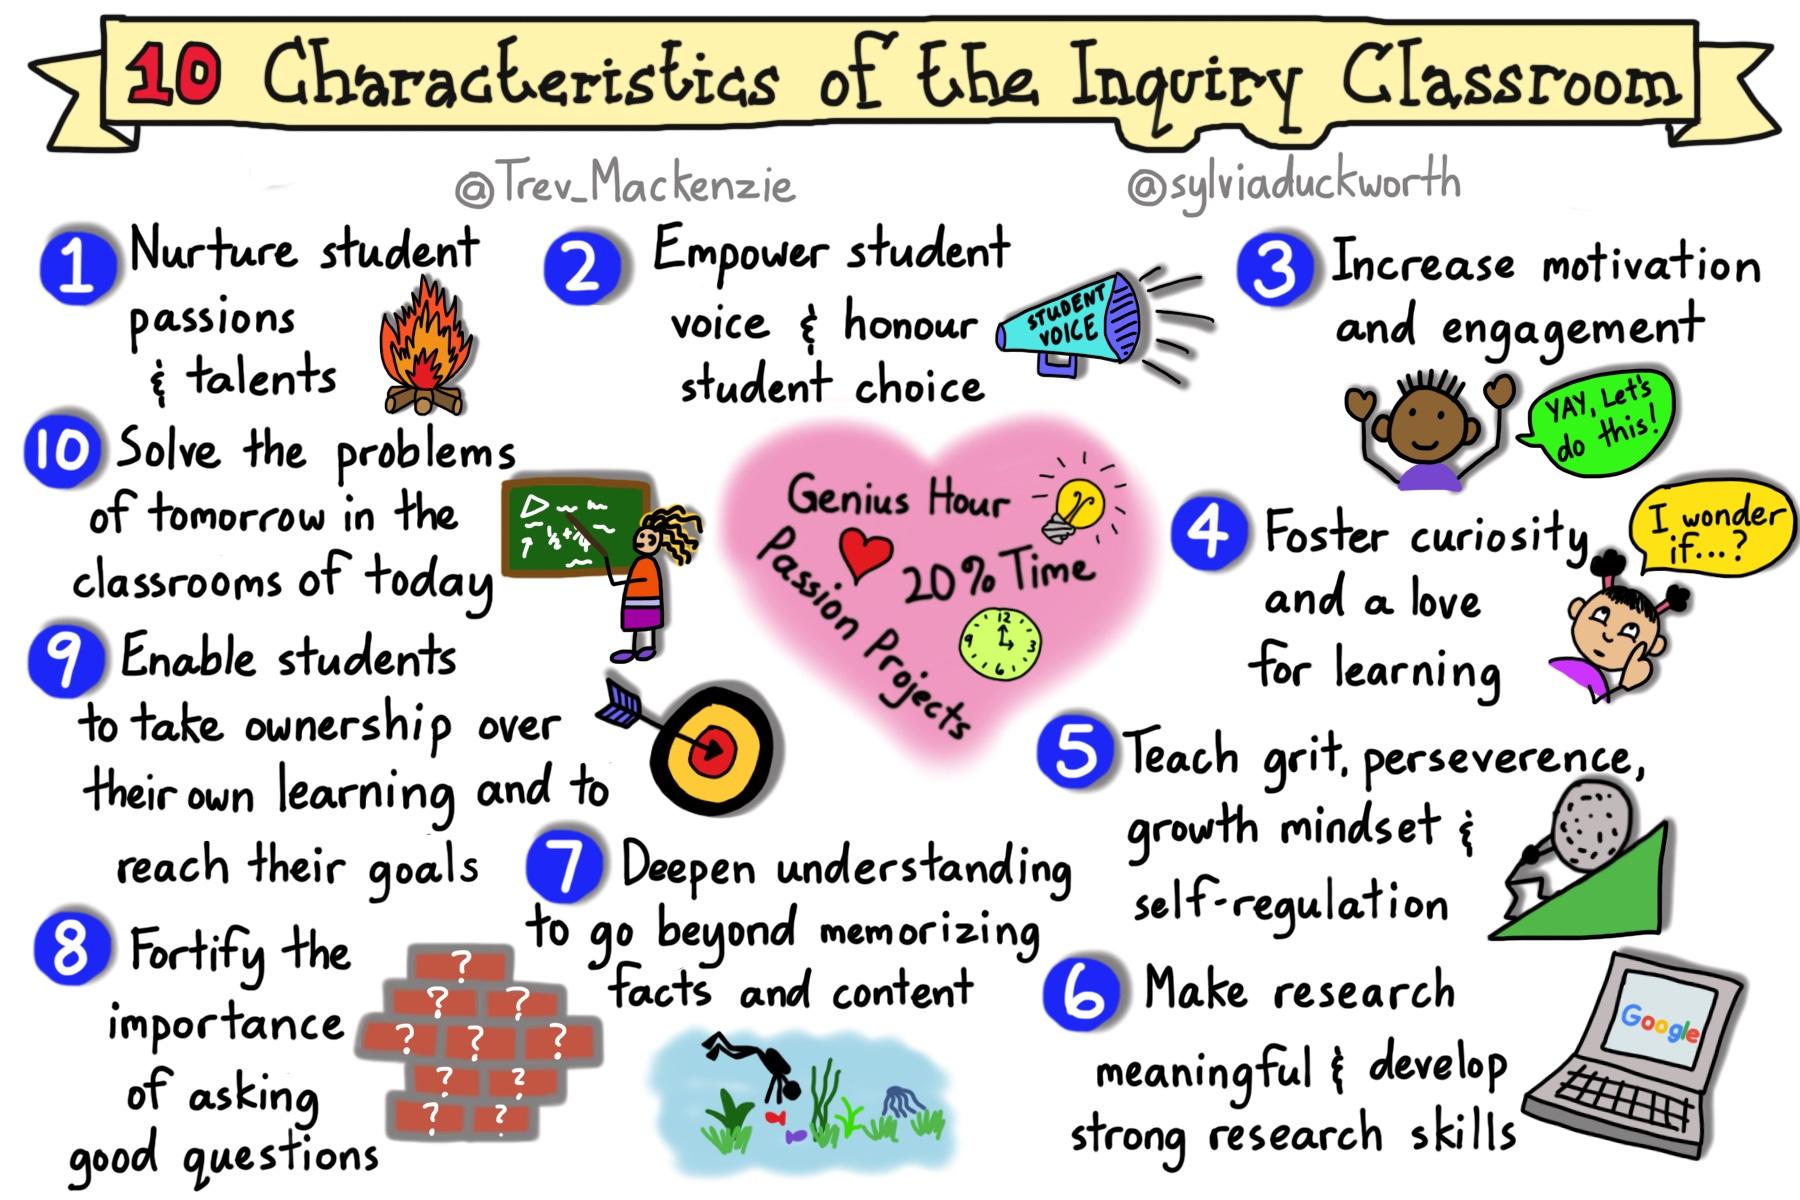 10 Characteristics of the Inquiry Classroom.jpg